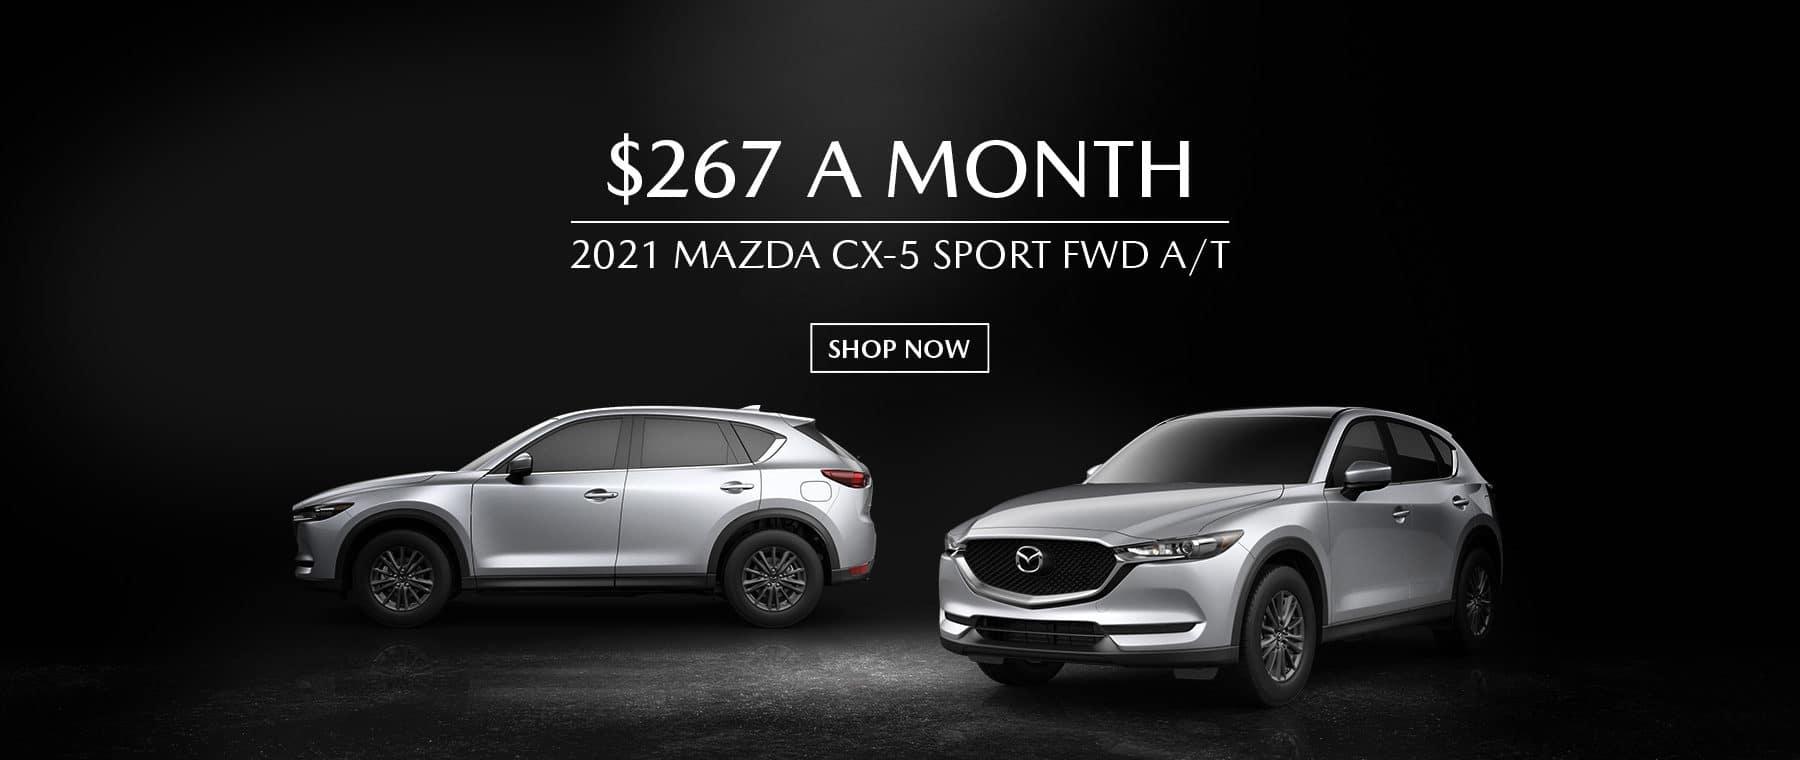 2021 Mazda CX-5 Special